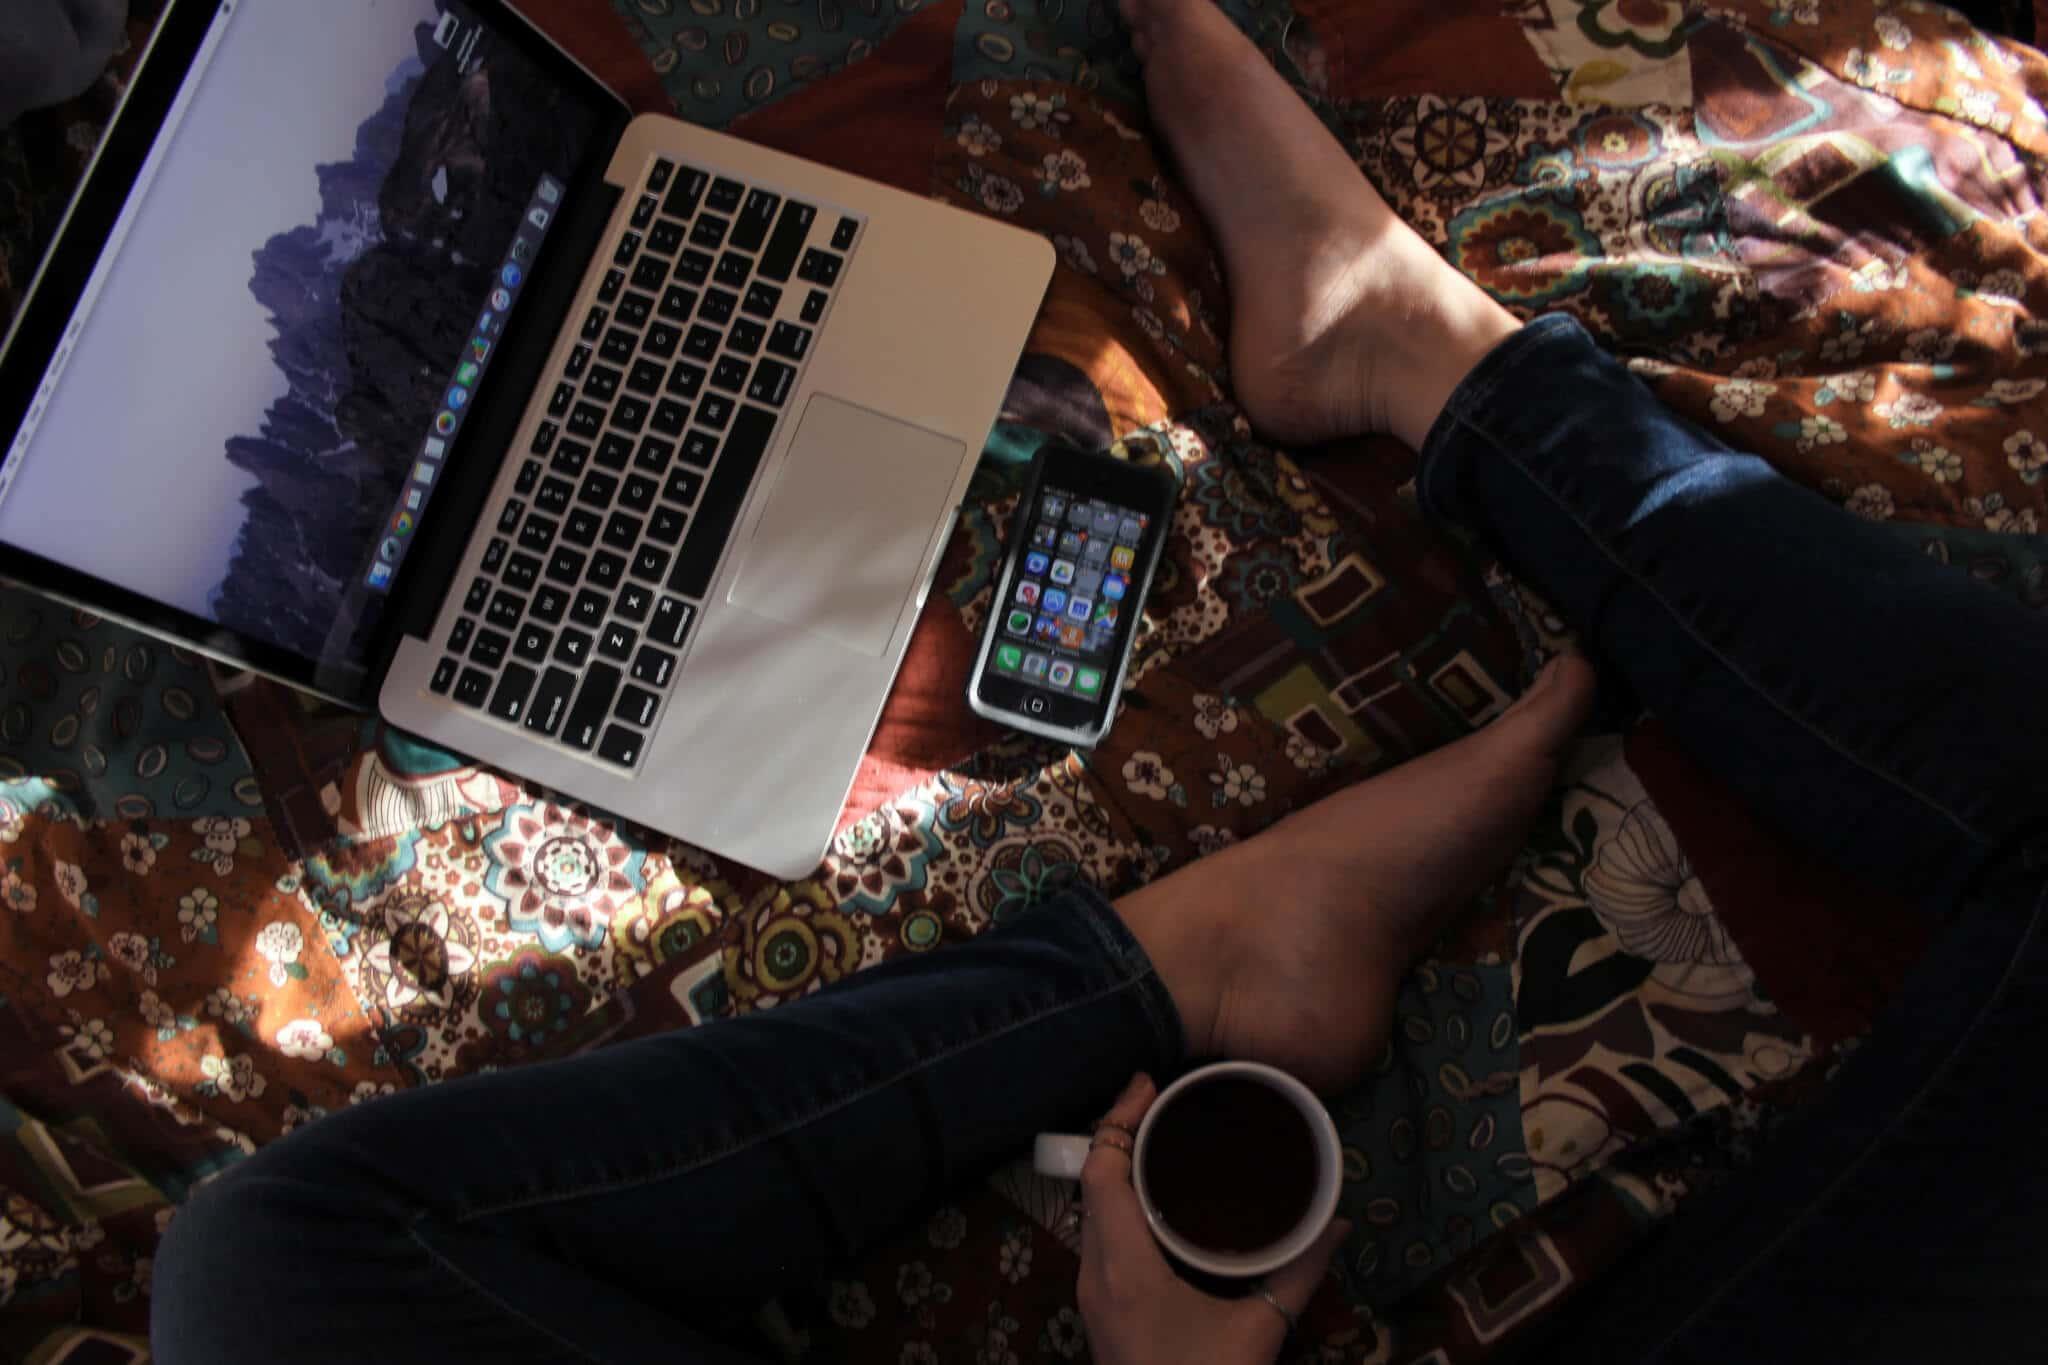 Flexible working: productive or destructive? 1